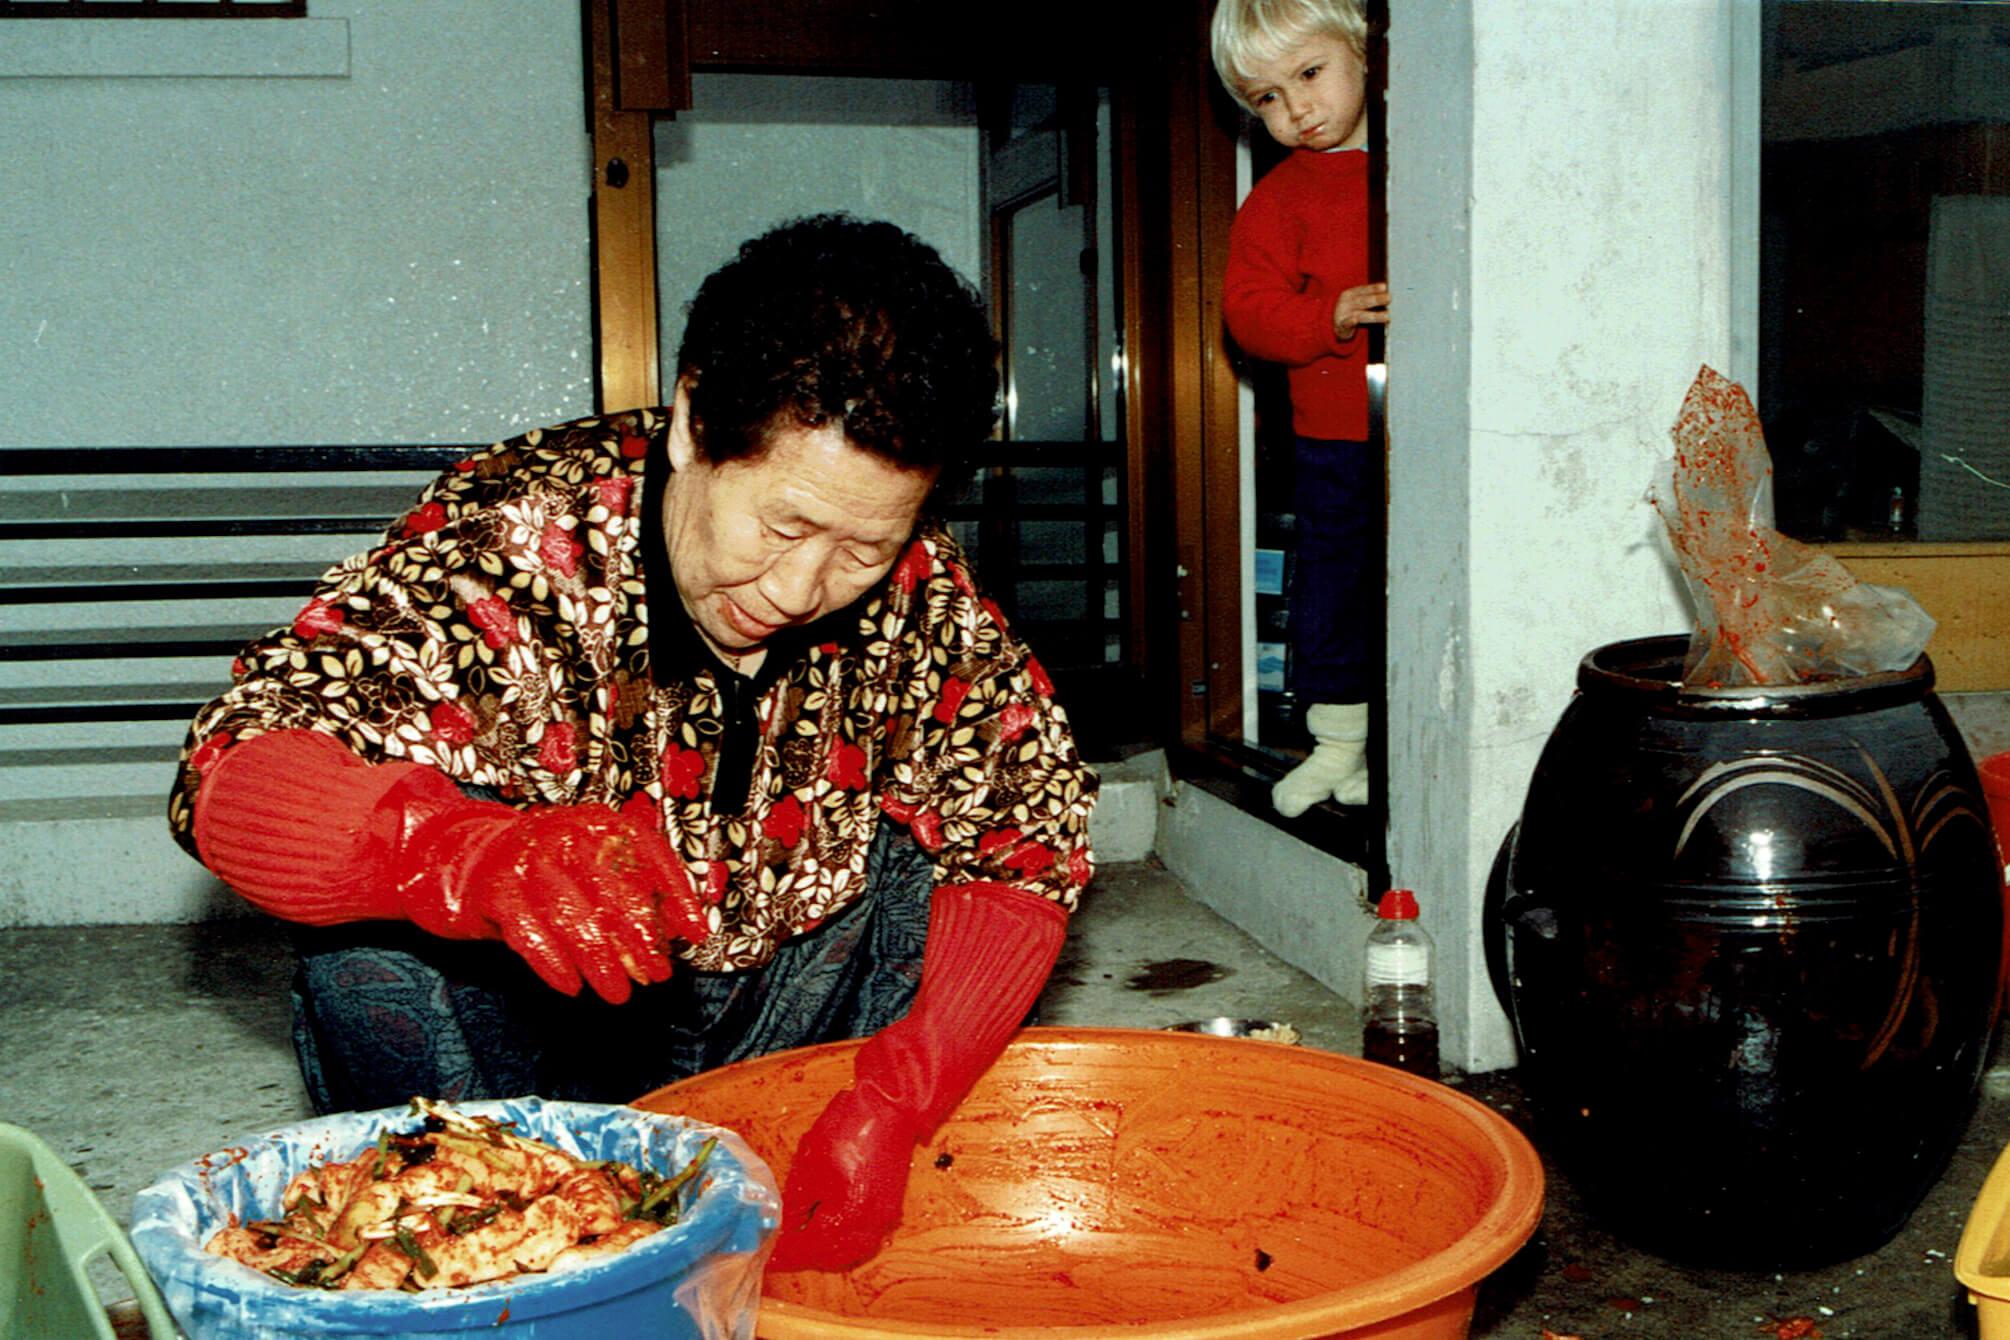 Kinder, Kimchi, Karriere - www.expatmamas.de/blog/ - #expatmamas #imauslandzuhause #südkorea